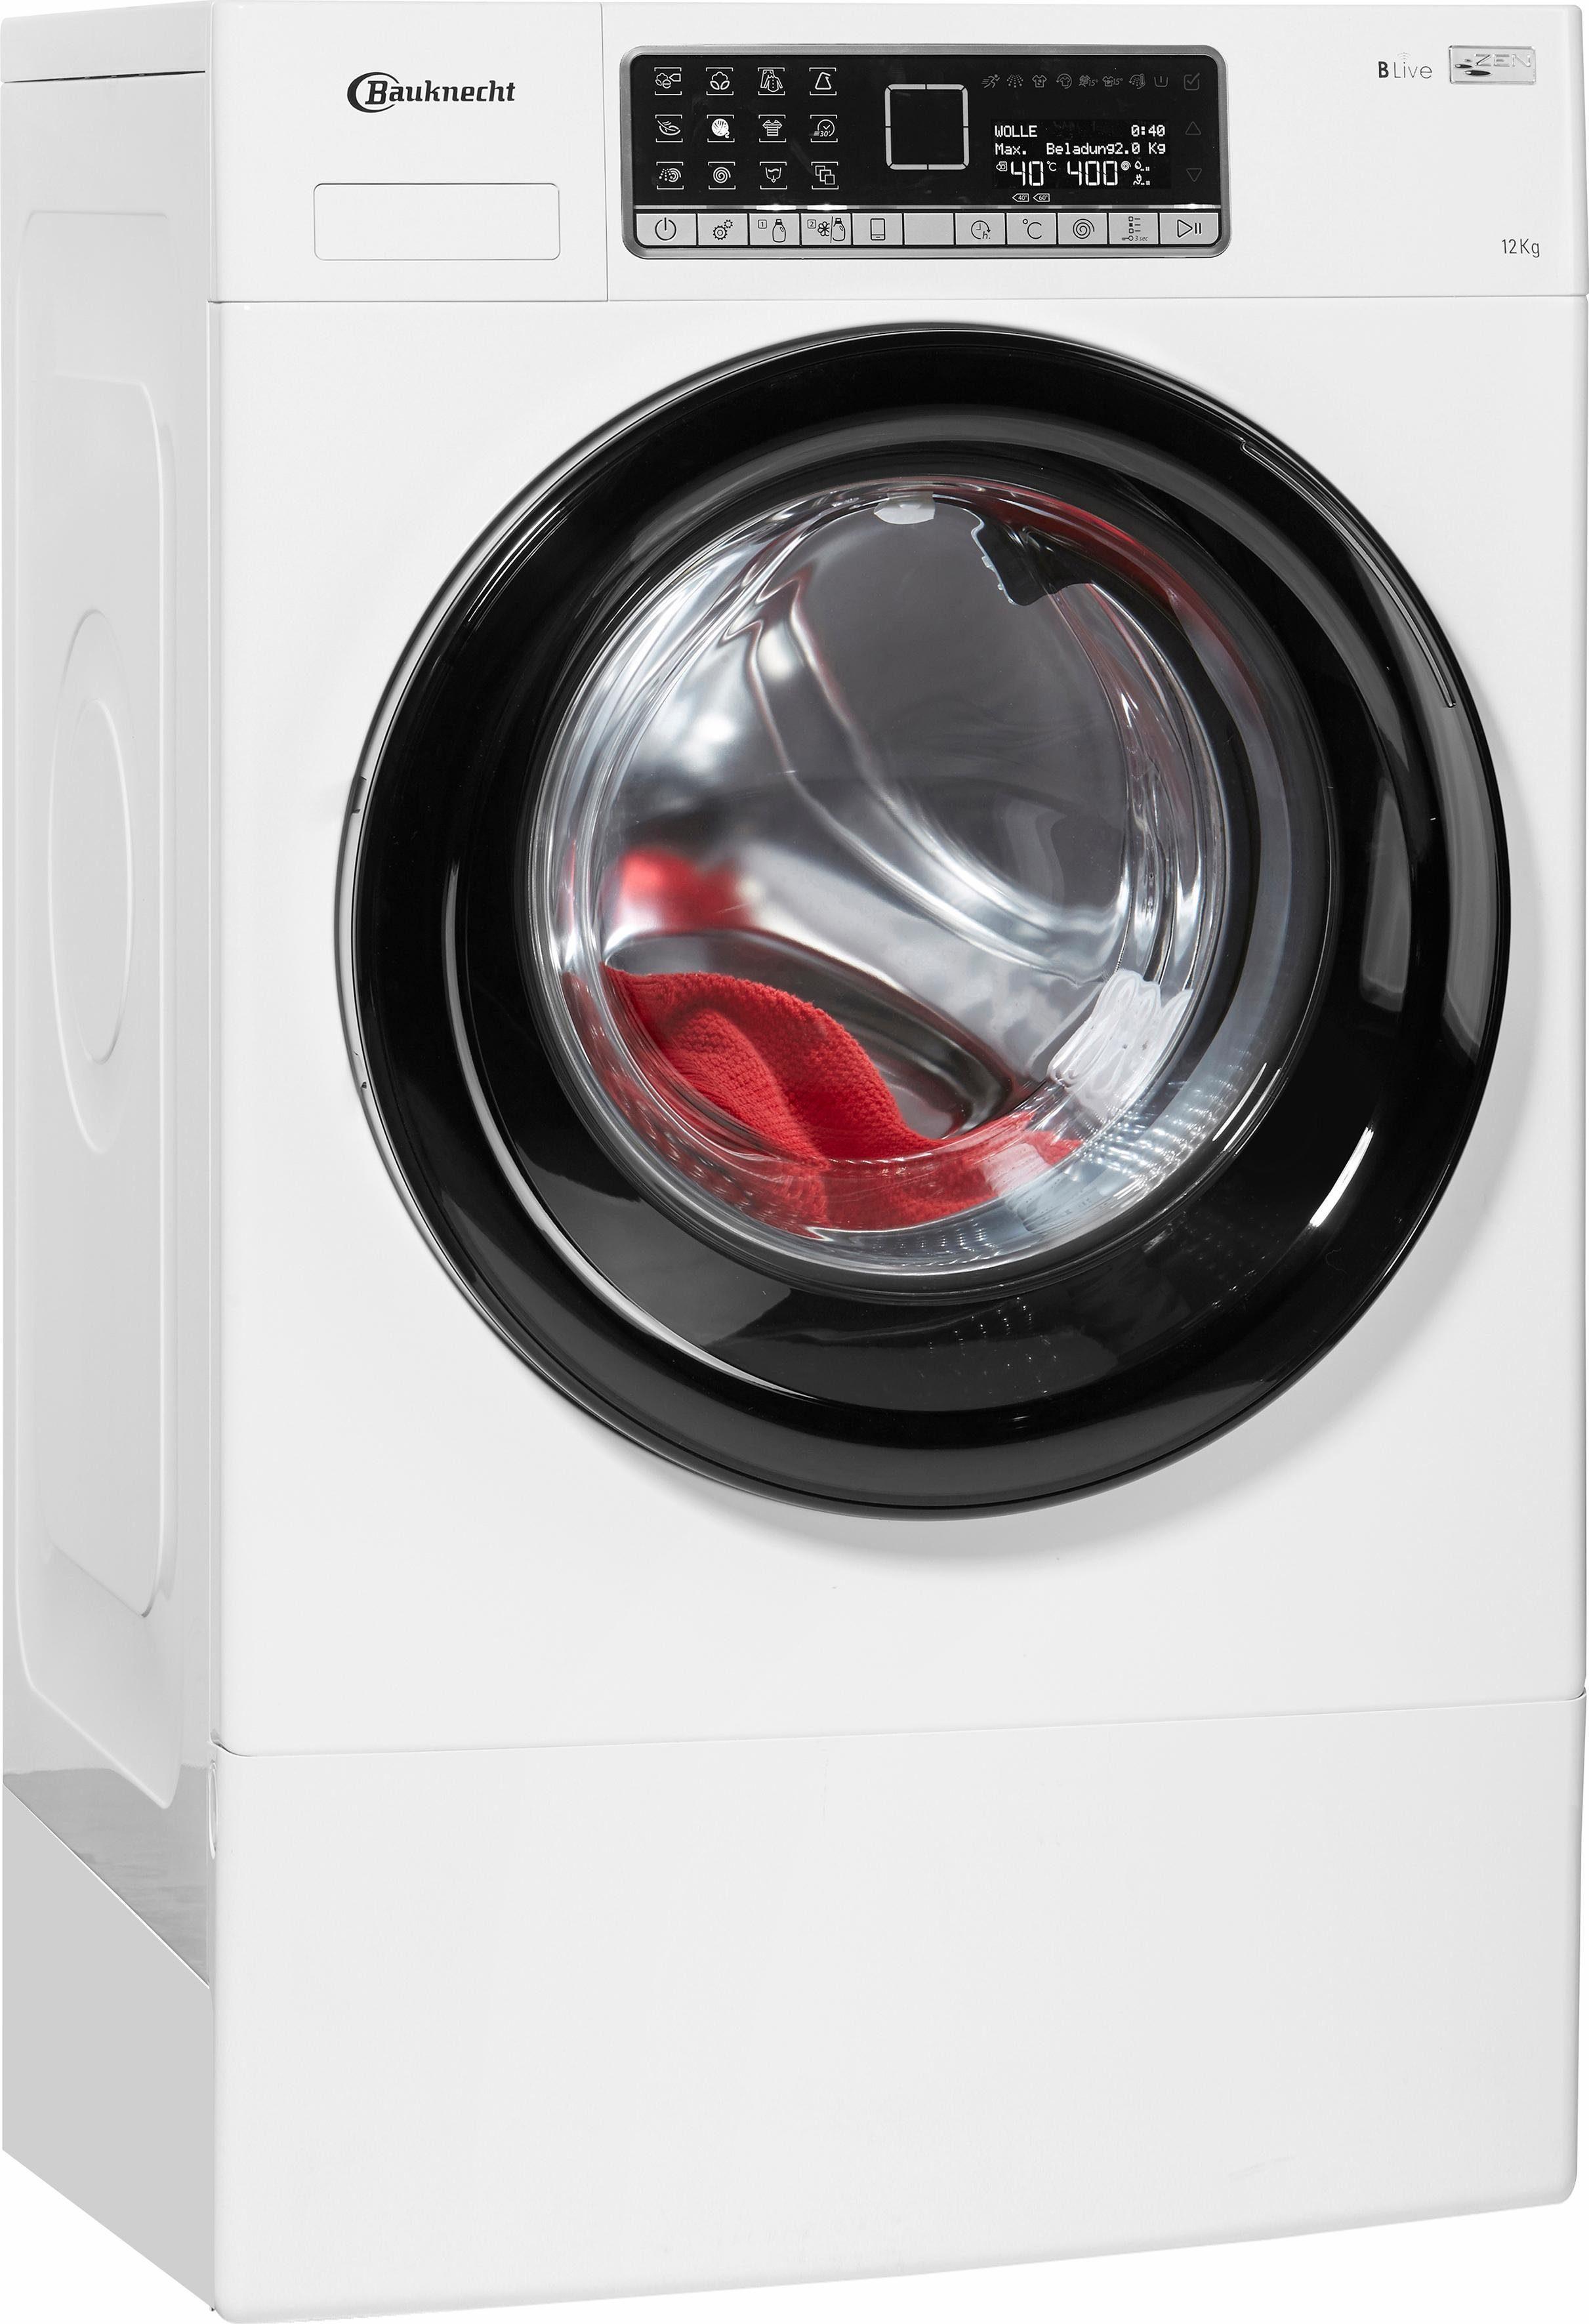 BAUKNECHT Waschmaschine WM Big 1224 ZEN KON, 12 kg, 1400 U/Min